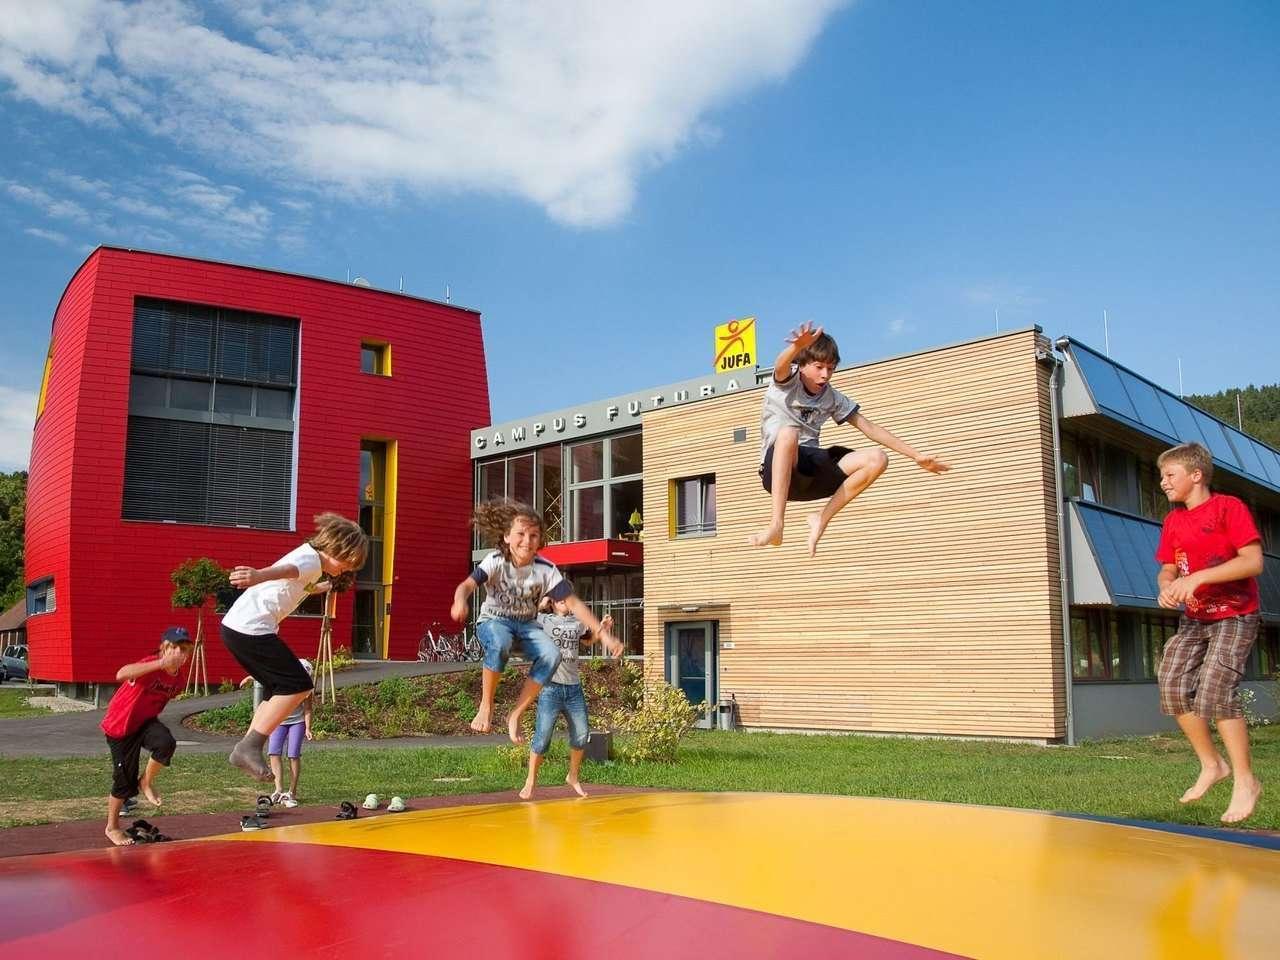 hotelansicht-jufa-hotel-bleiburg-pliberk-sport-resort-kinder-sommer_c_Johannes_Hloch_